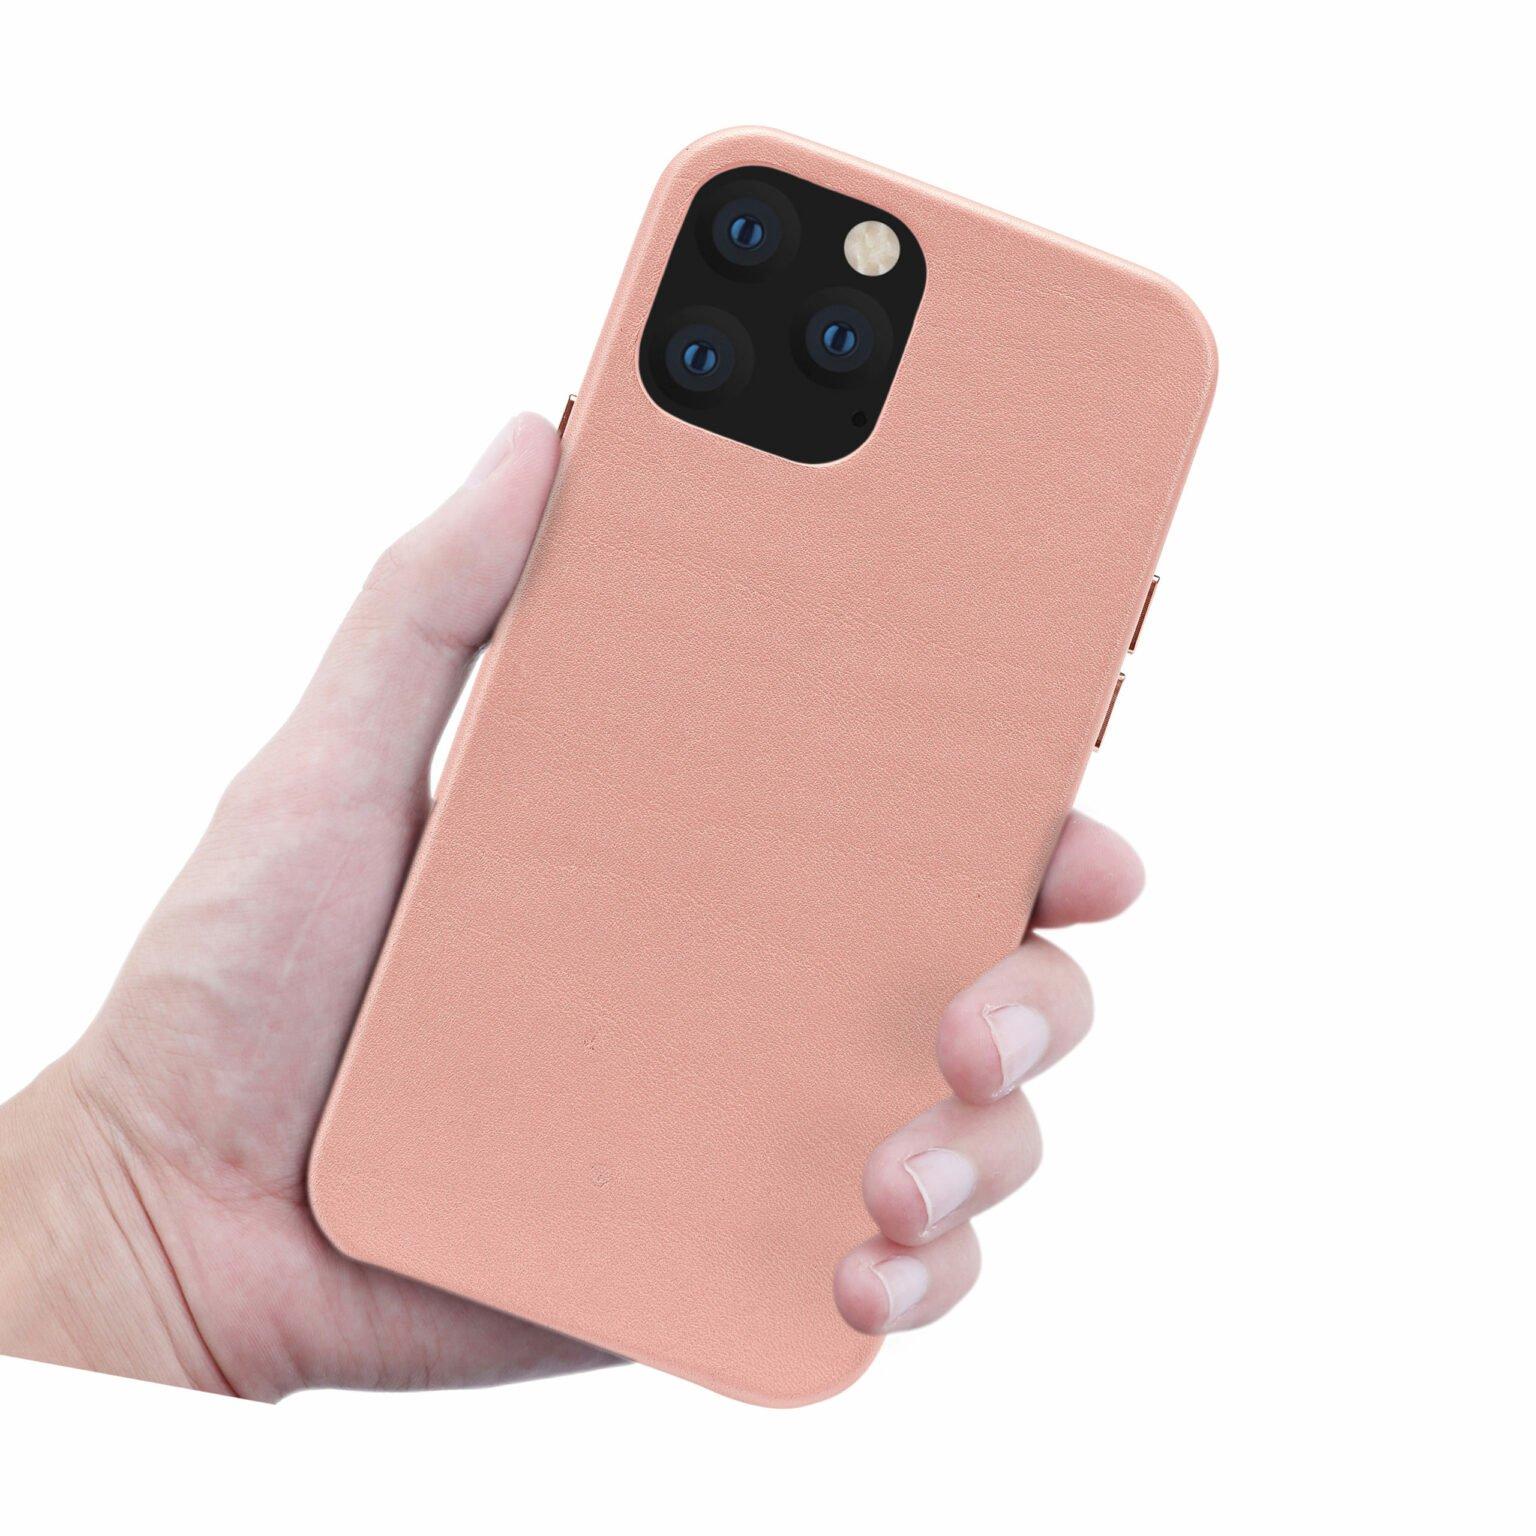 iPhone X/XS Full Wrap Case - Nude - Fone Express